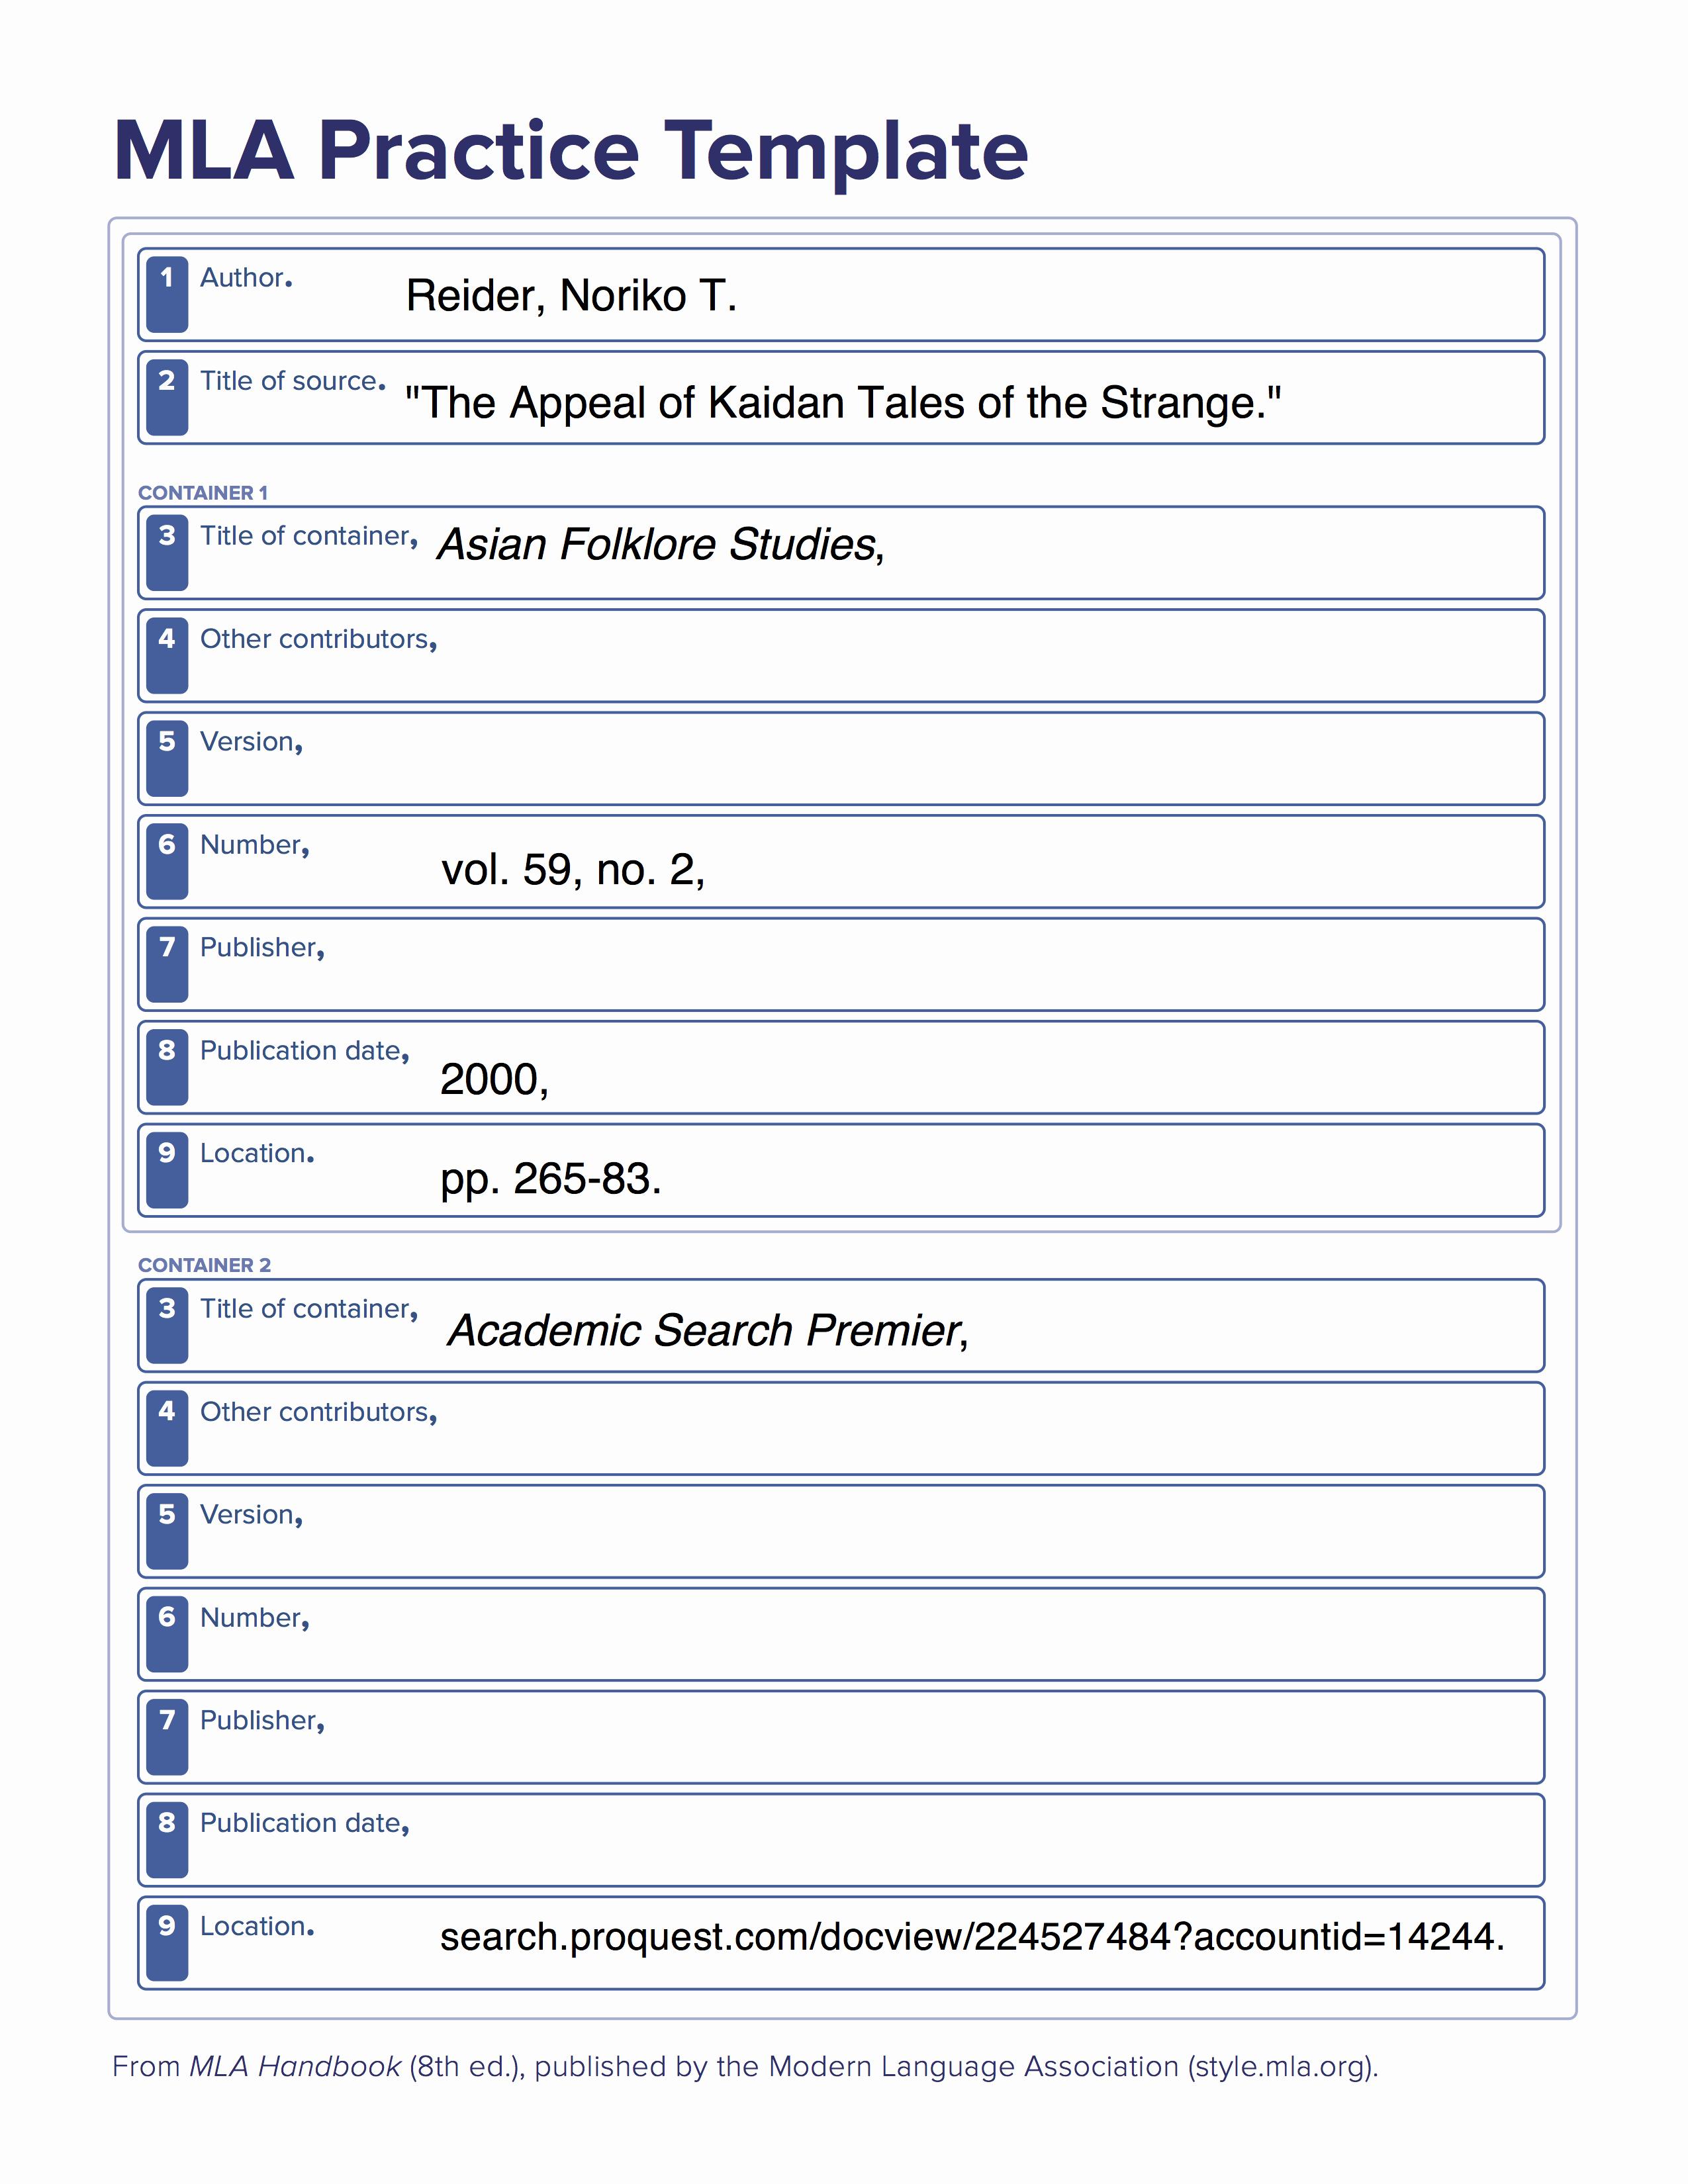 Mla 8th Ed Citing Information Libguides at University